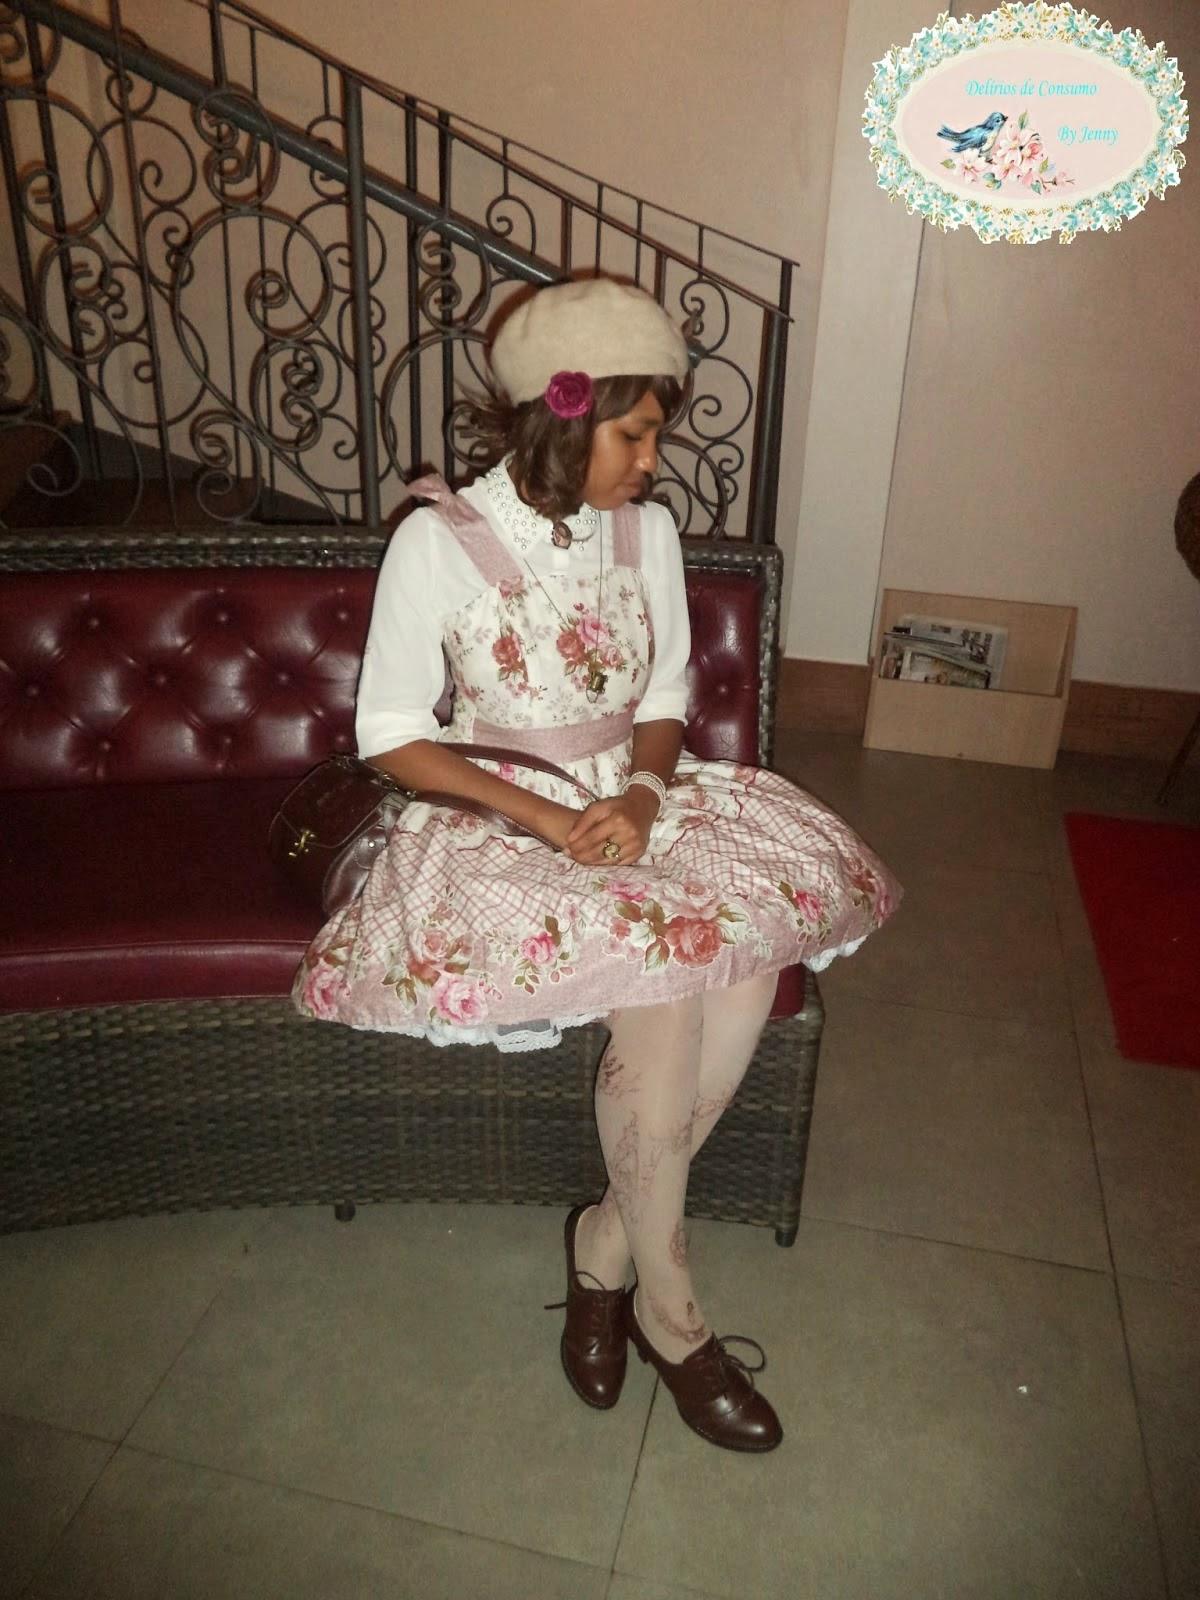 http://deliriosdeconsumismo.blogspot.com.br/2014/05/ultimos-outfits-lolita.html